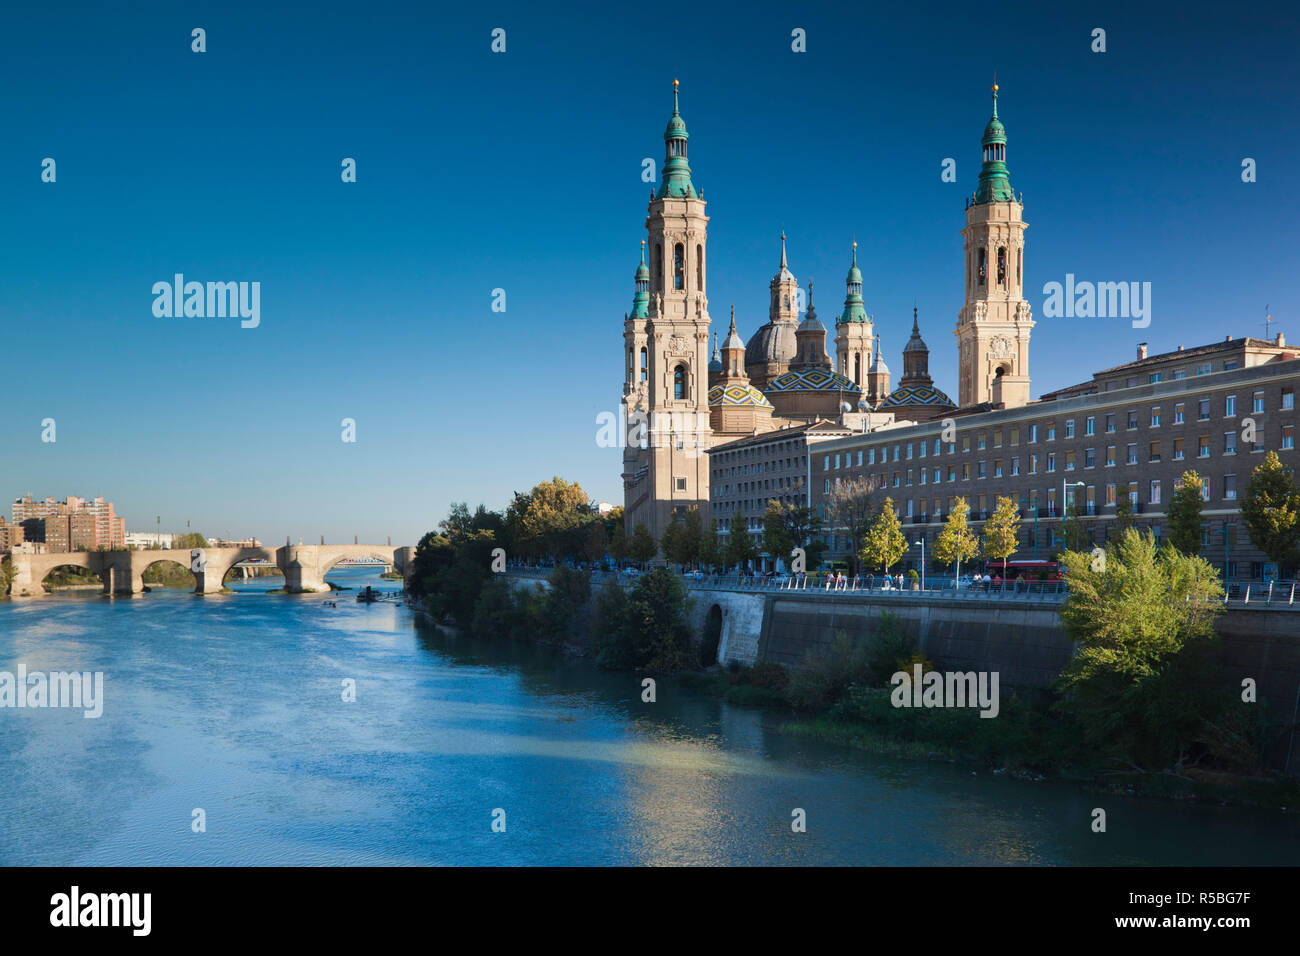 Spain, Aragon Region, Zaragoza Province, Zaragoza, Basilica de Nuestra Senora de Pilar on the Ebro River - Stock Image